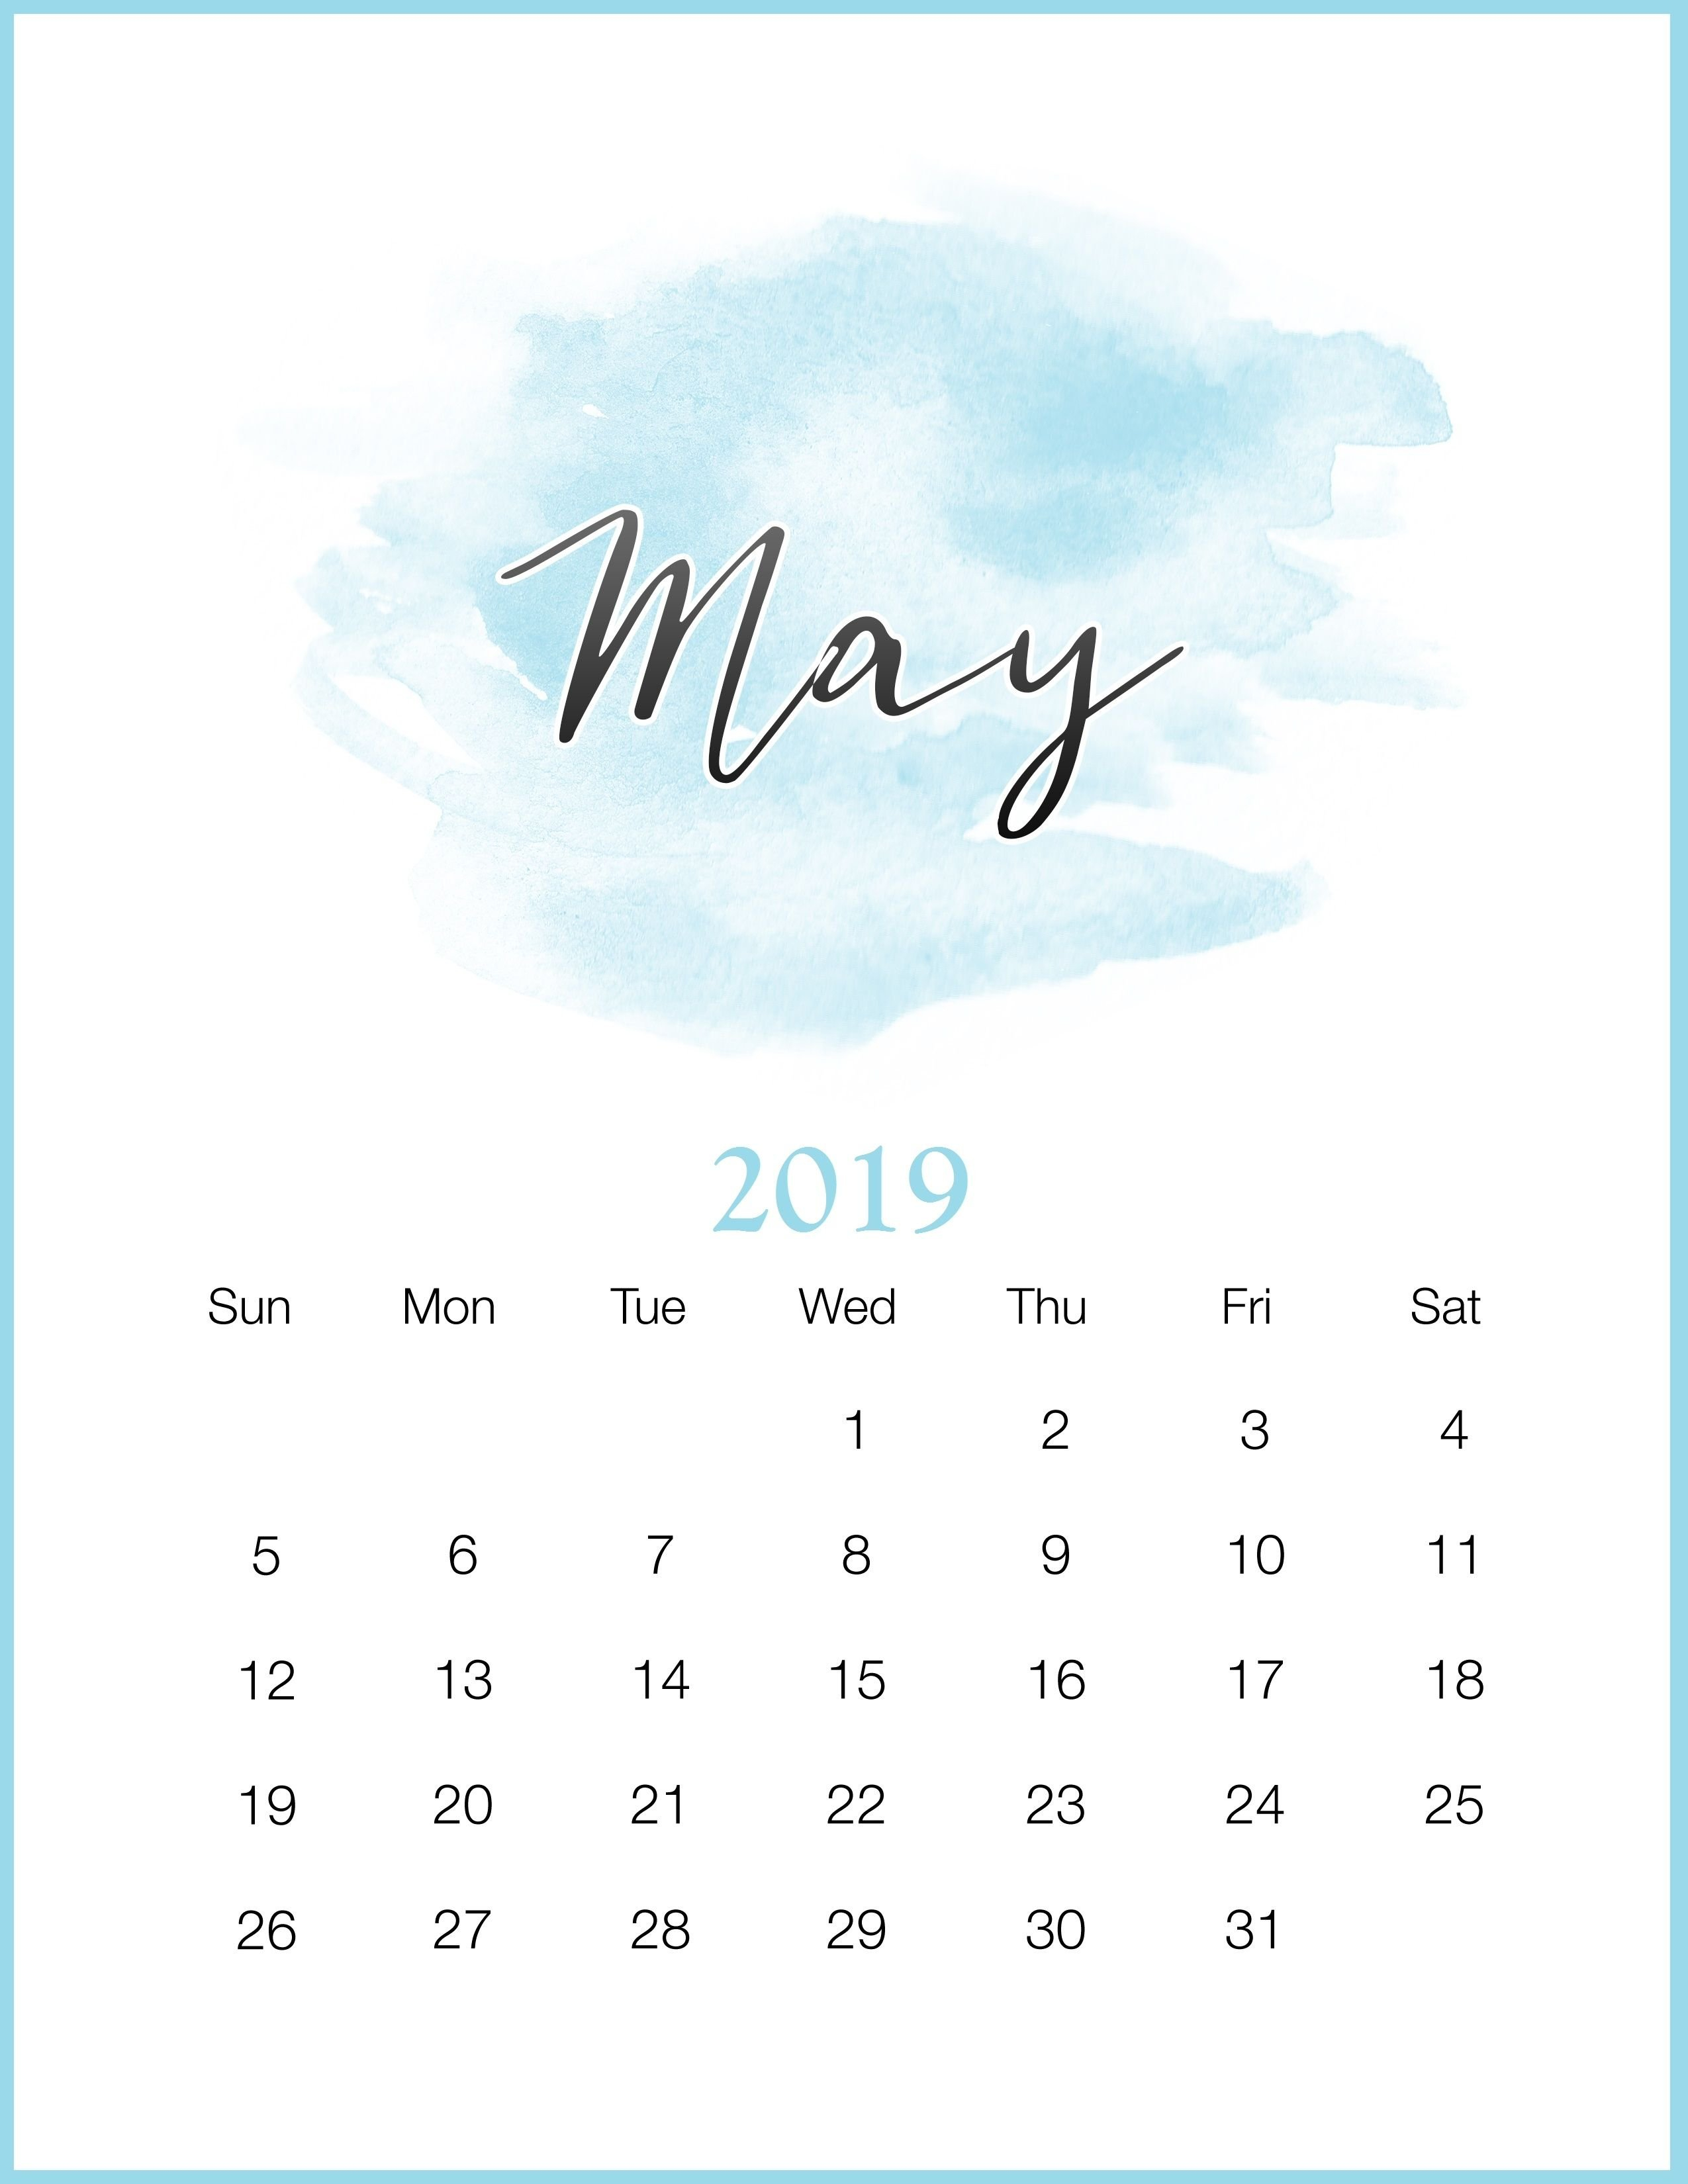 Watercolor 2019 Monthly Printable Calendar Calendar 2019May 2019 May 7 2019 Calendar